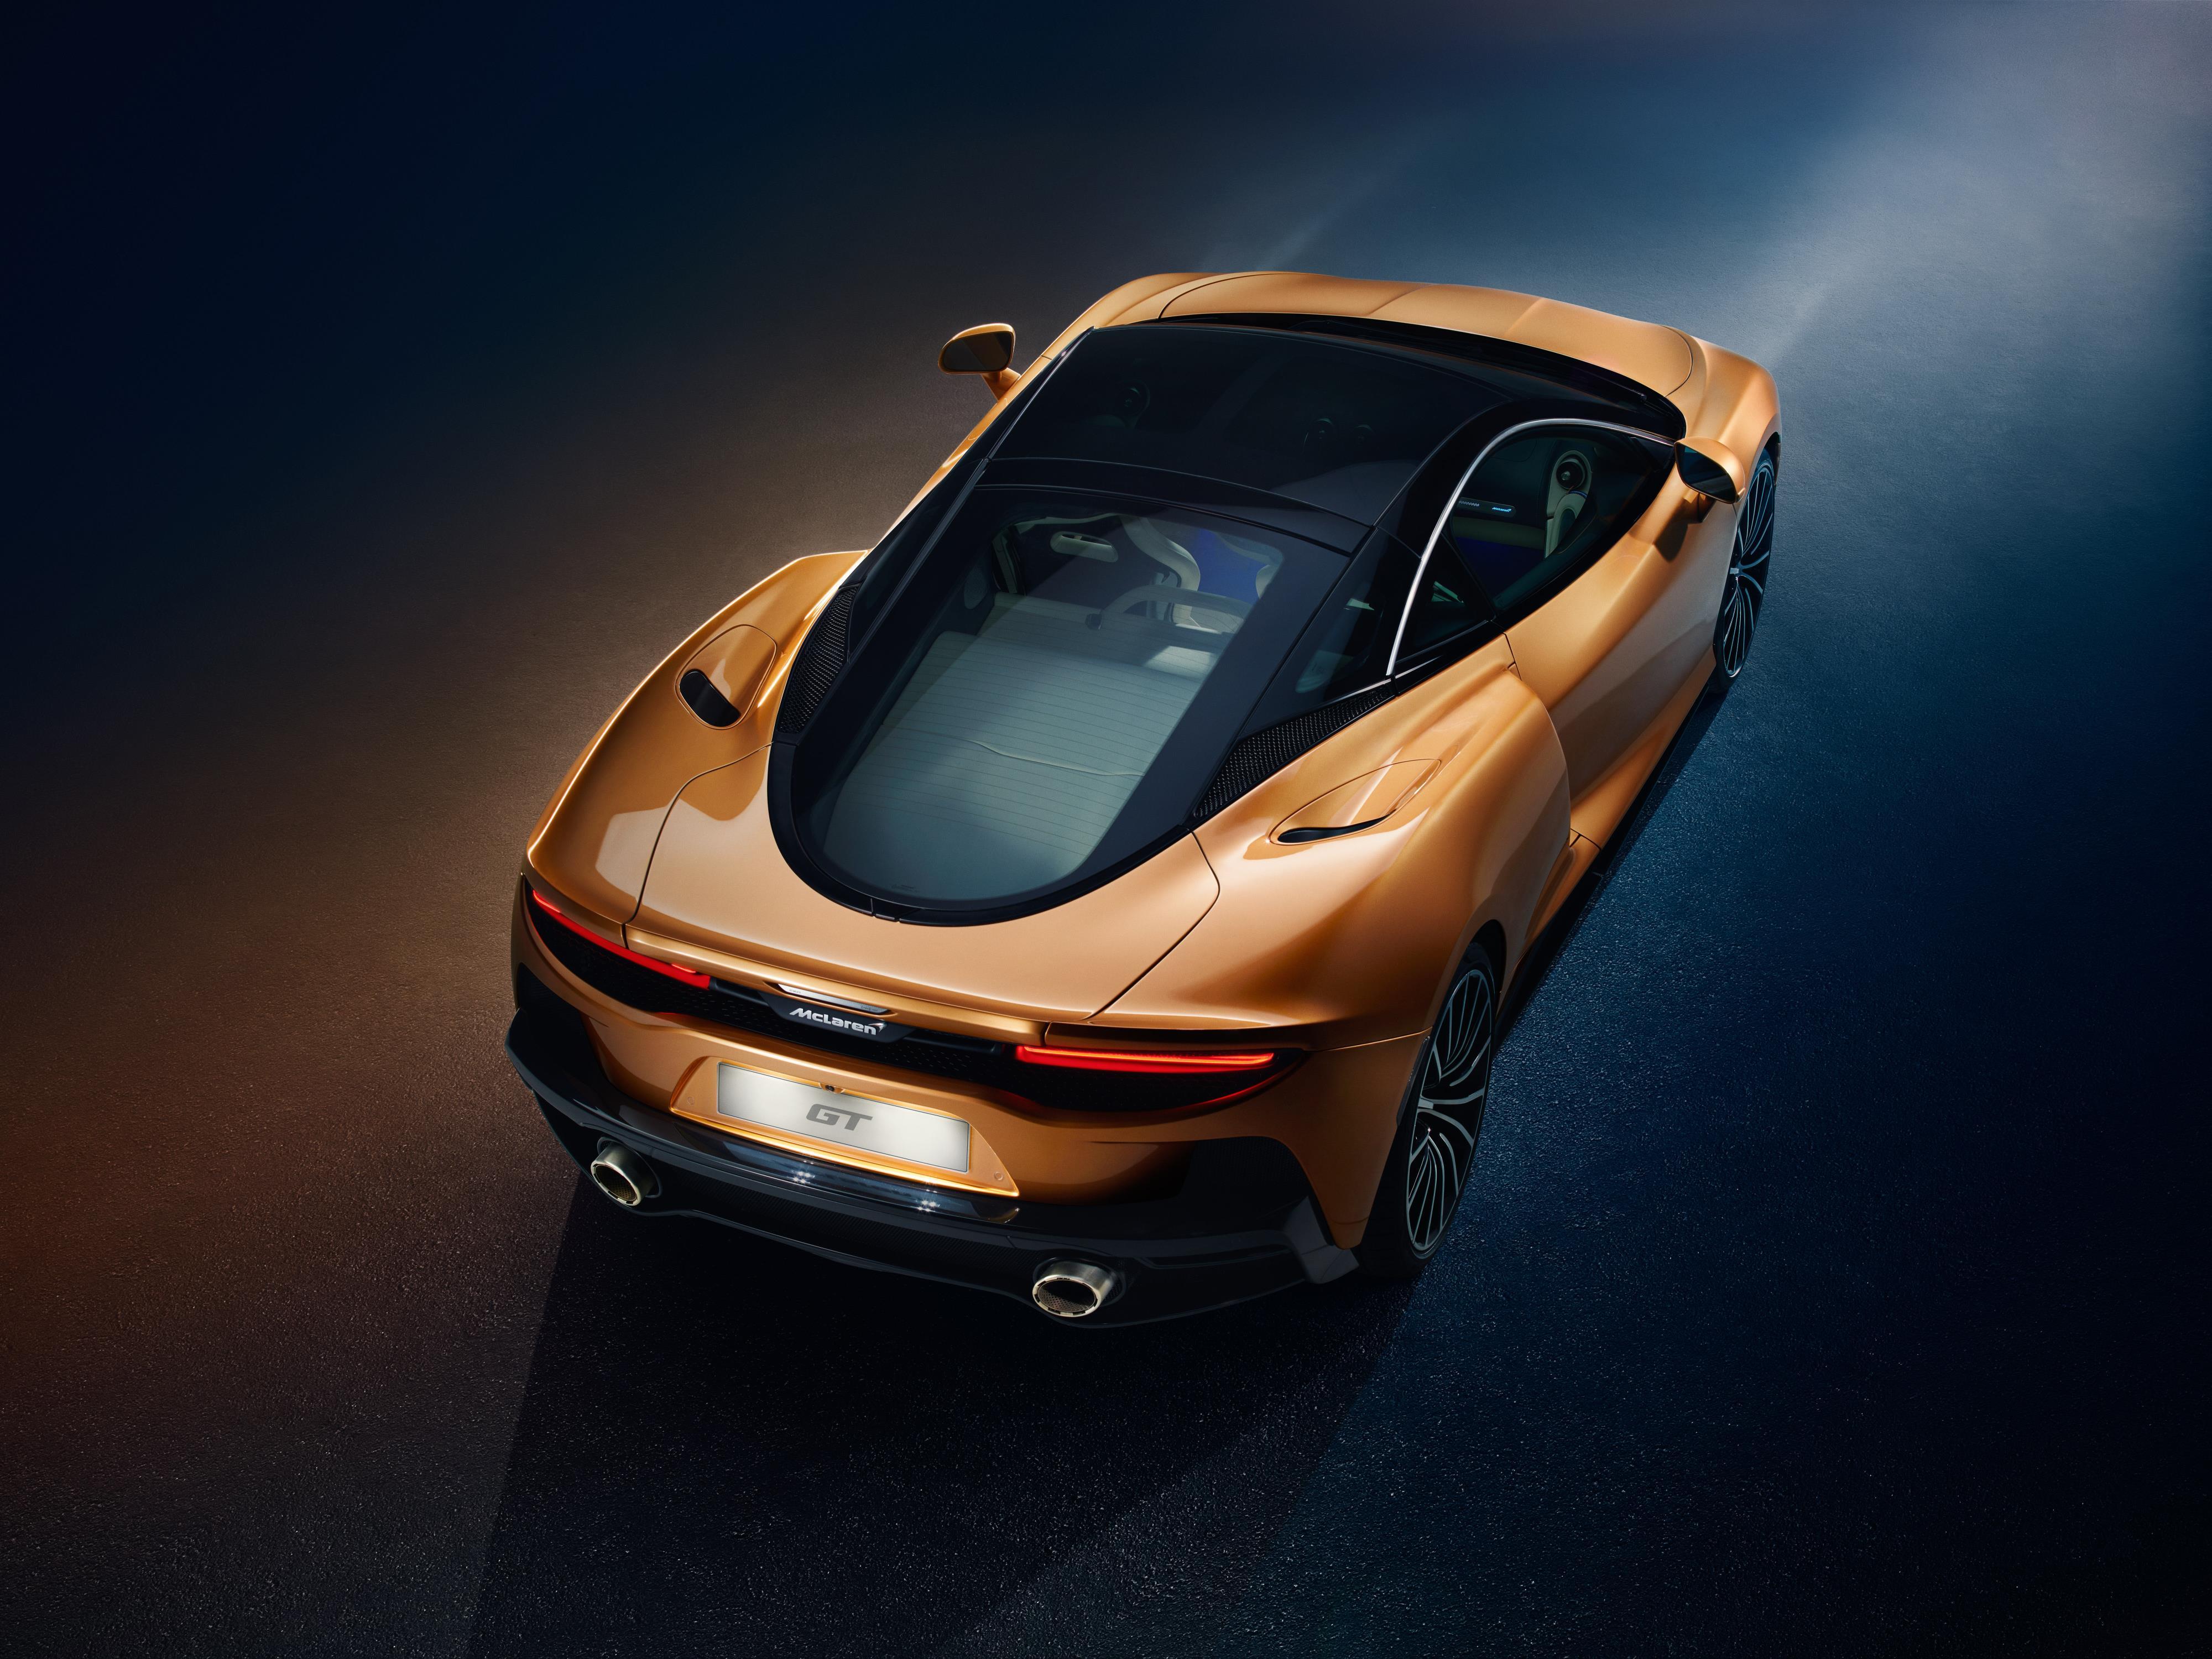 McLaren GT Panoramic Roof